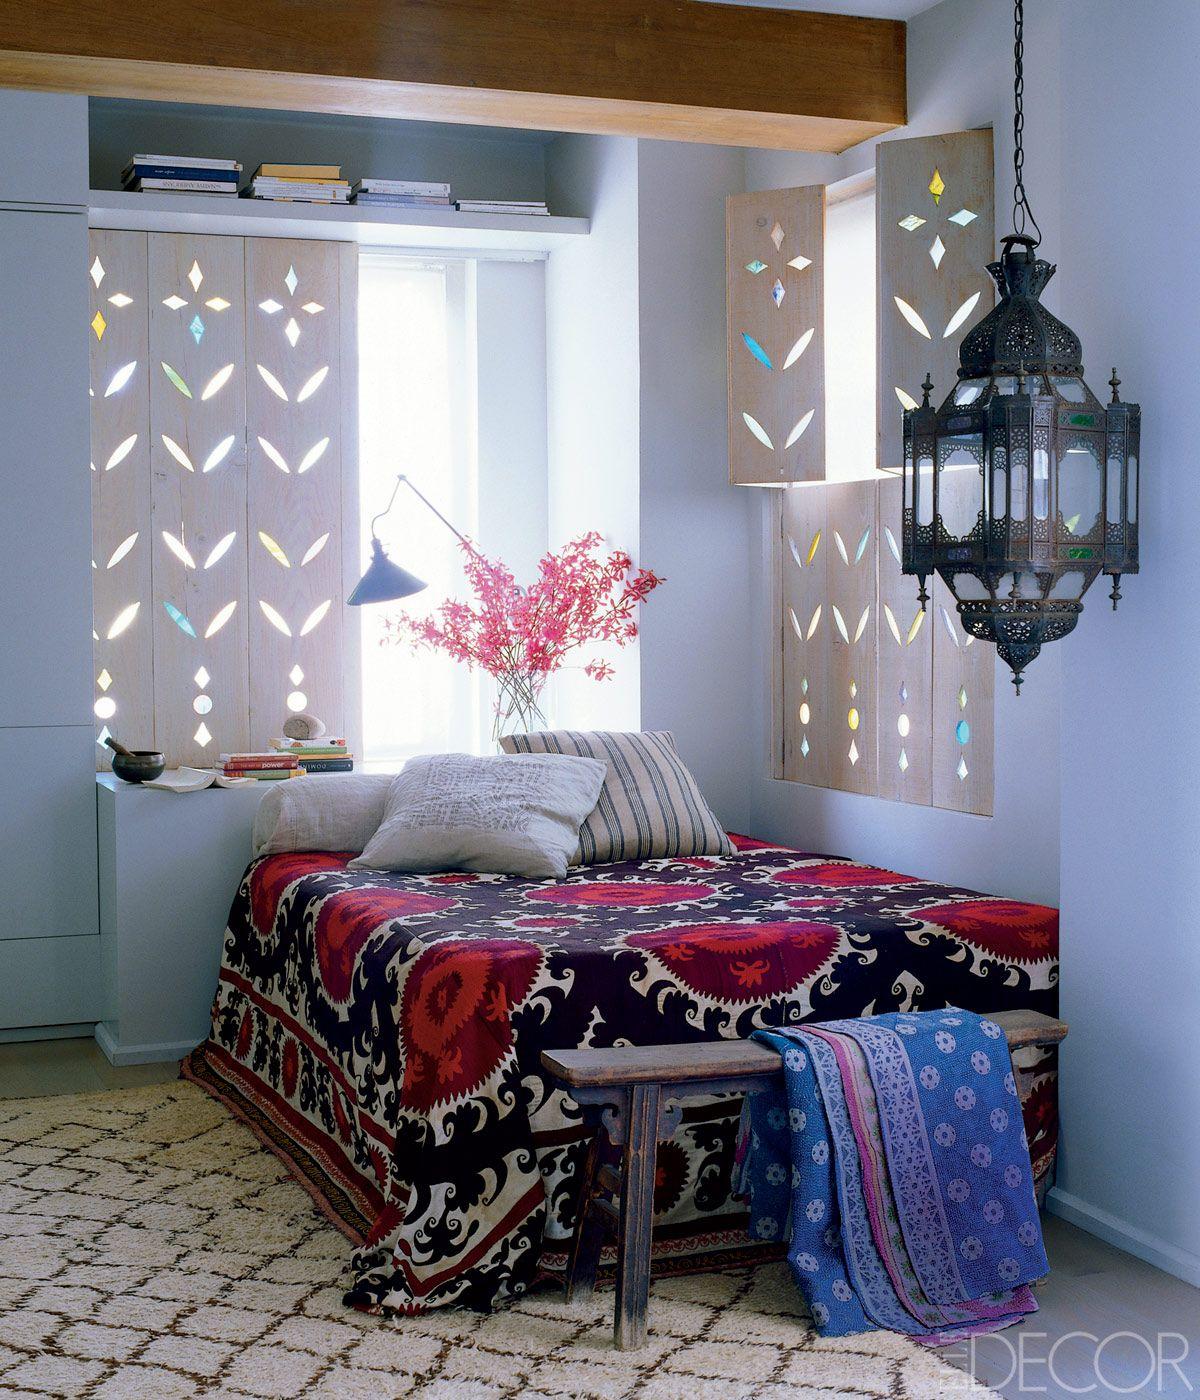 14 ways to decorate an awkward corner amipublicfo Choice Image